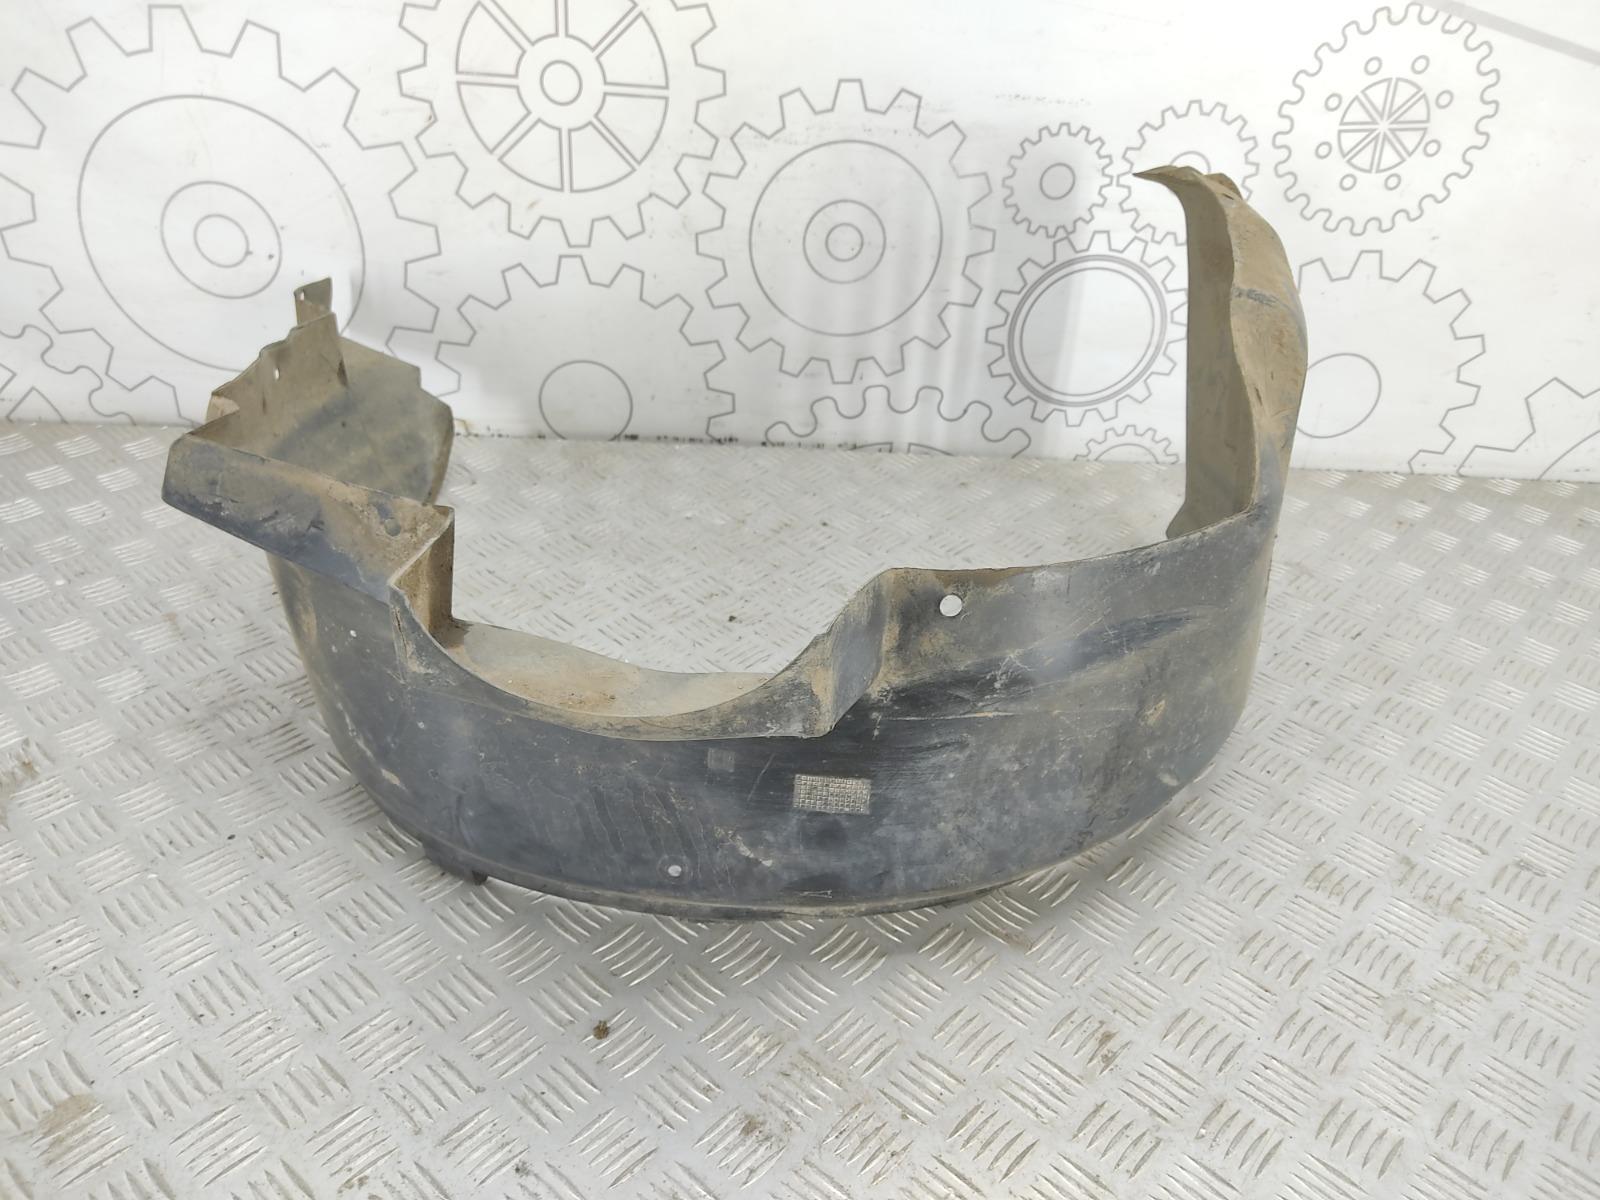 Защита арок передняя правая (подкрылок) Opel Omega B 2.2 I 2003 (б/у)